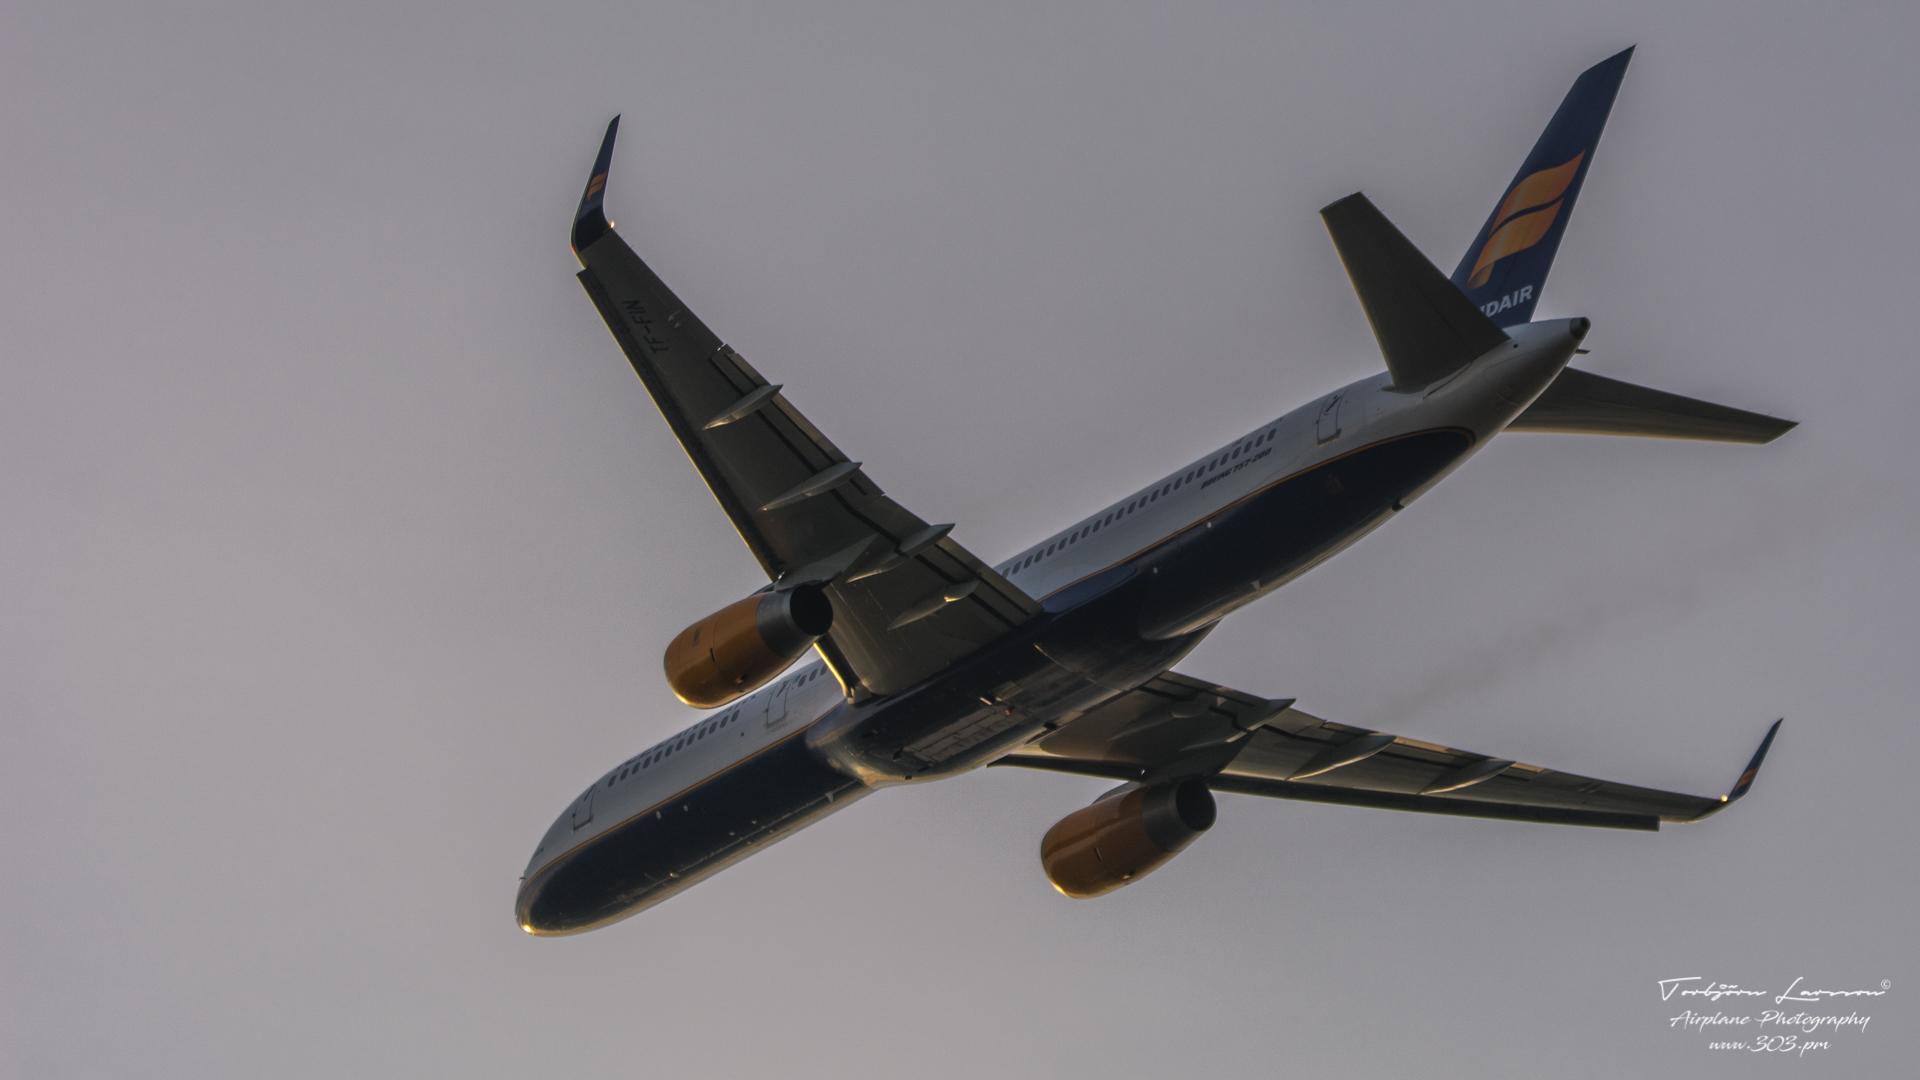 ACE_7151-Boeing 757-208 - Icelandair TF-FIN